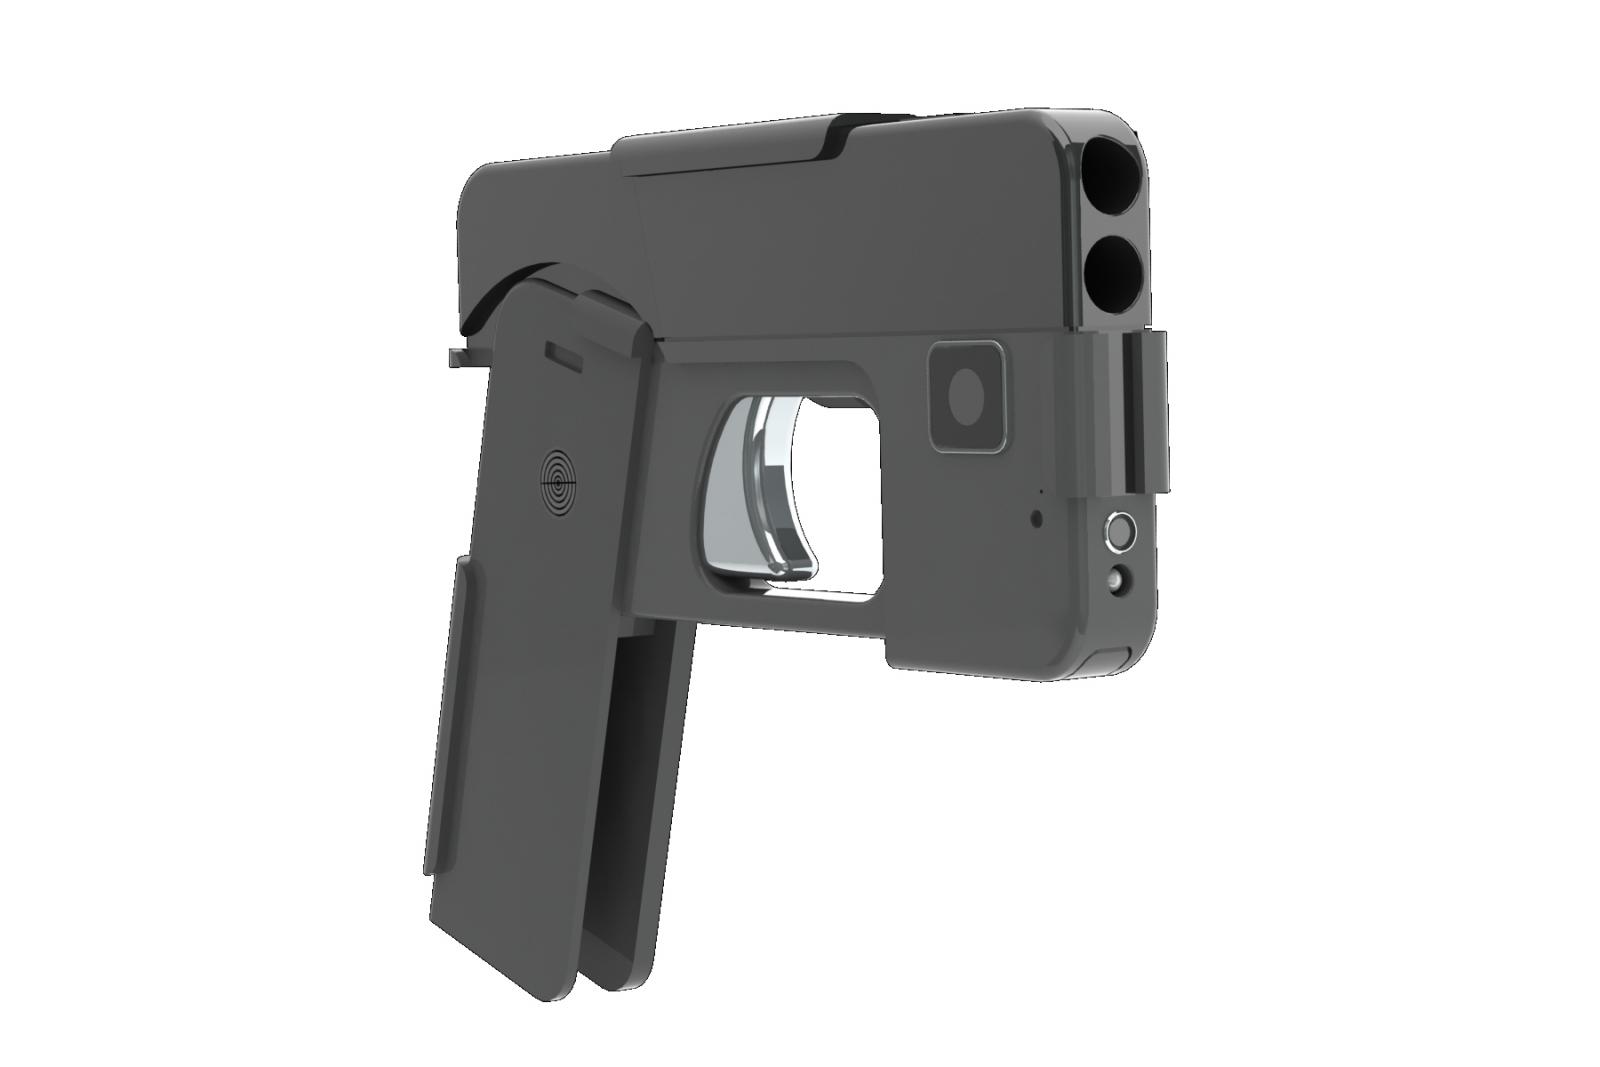 Ideal Conceal pistol